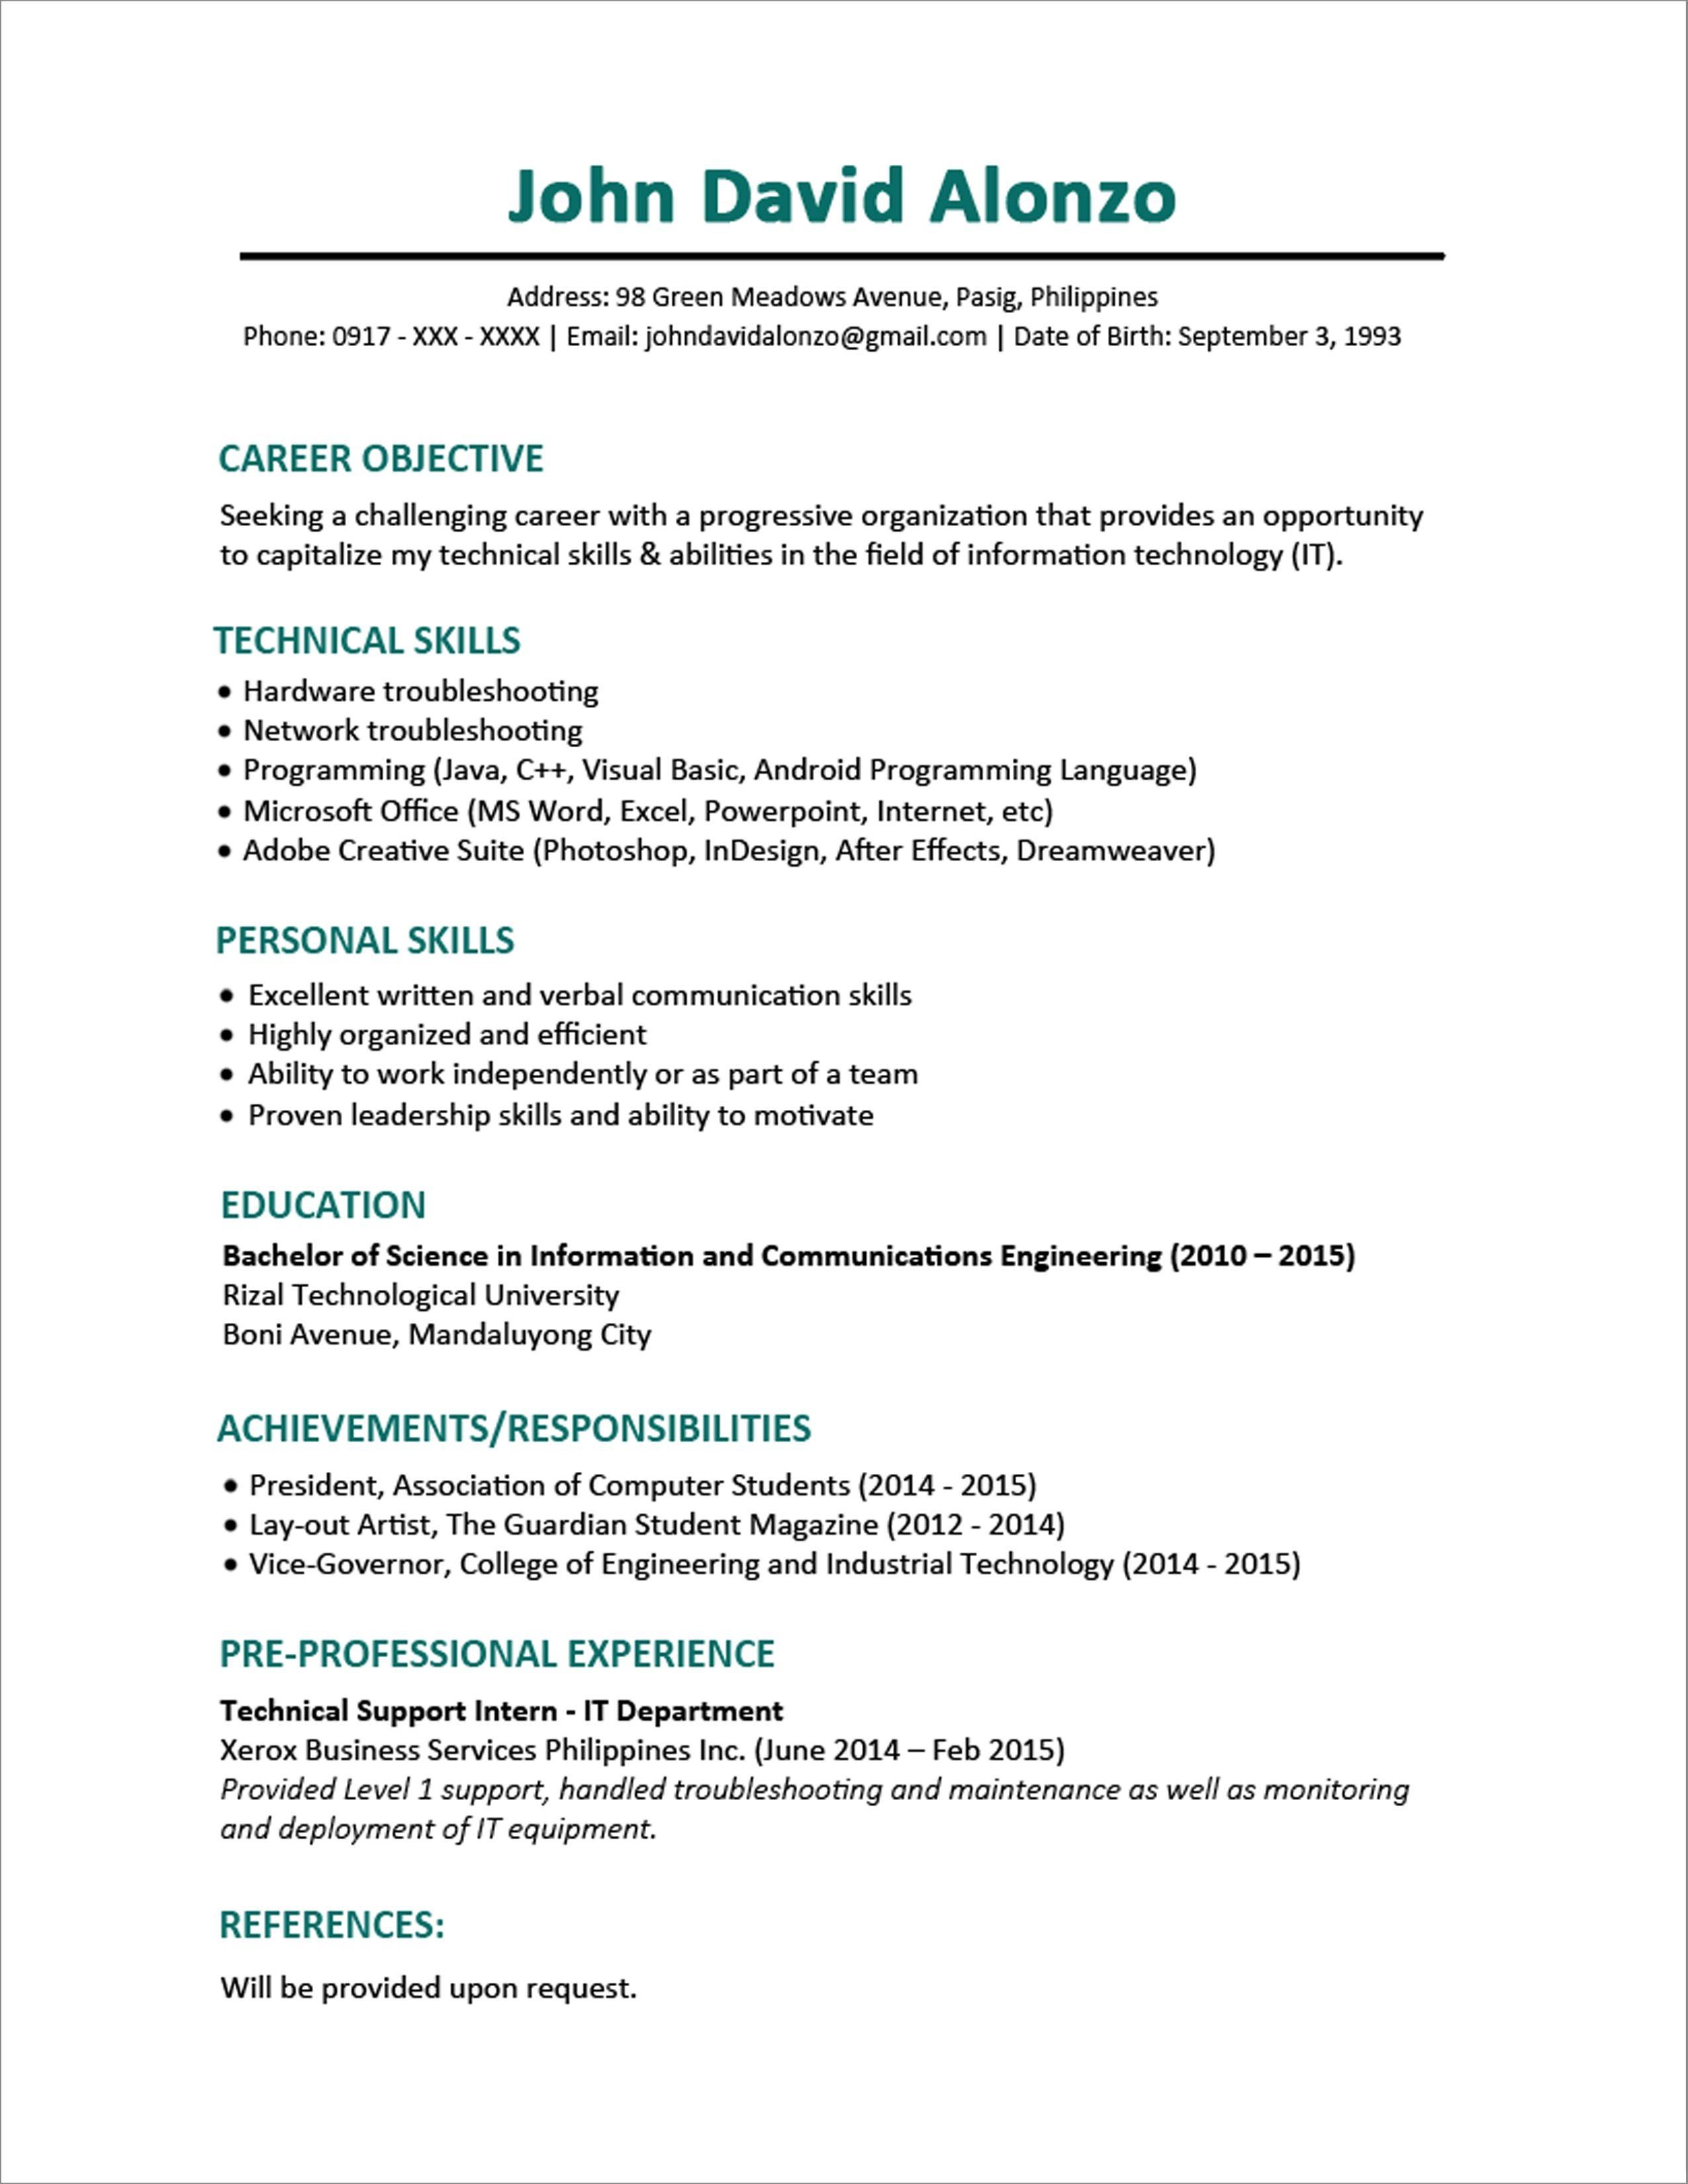 New Graduates Resume objective examples, Resume skills